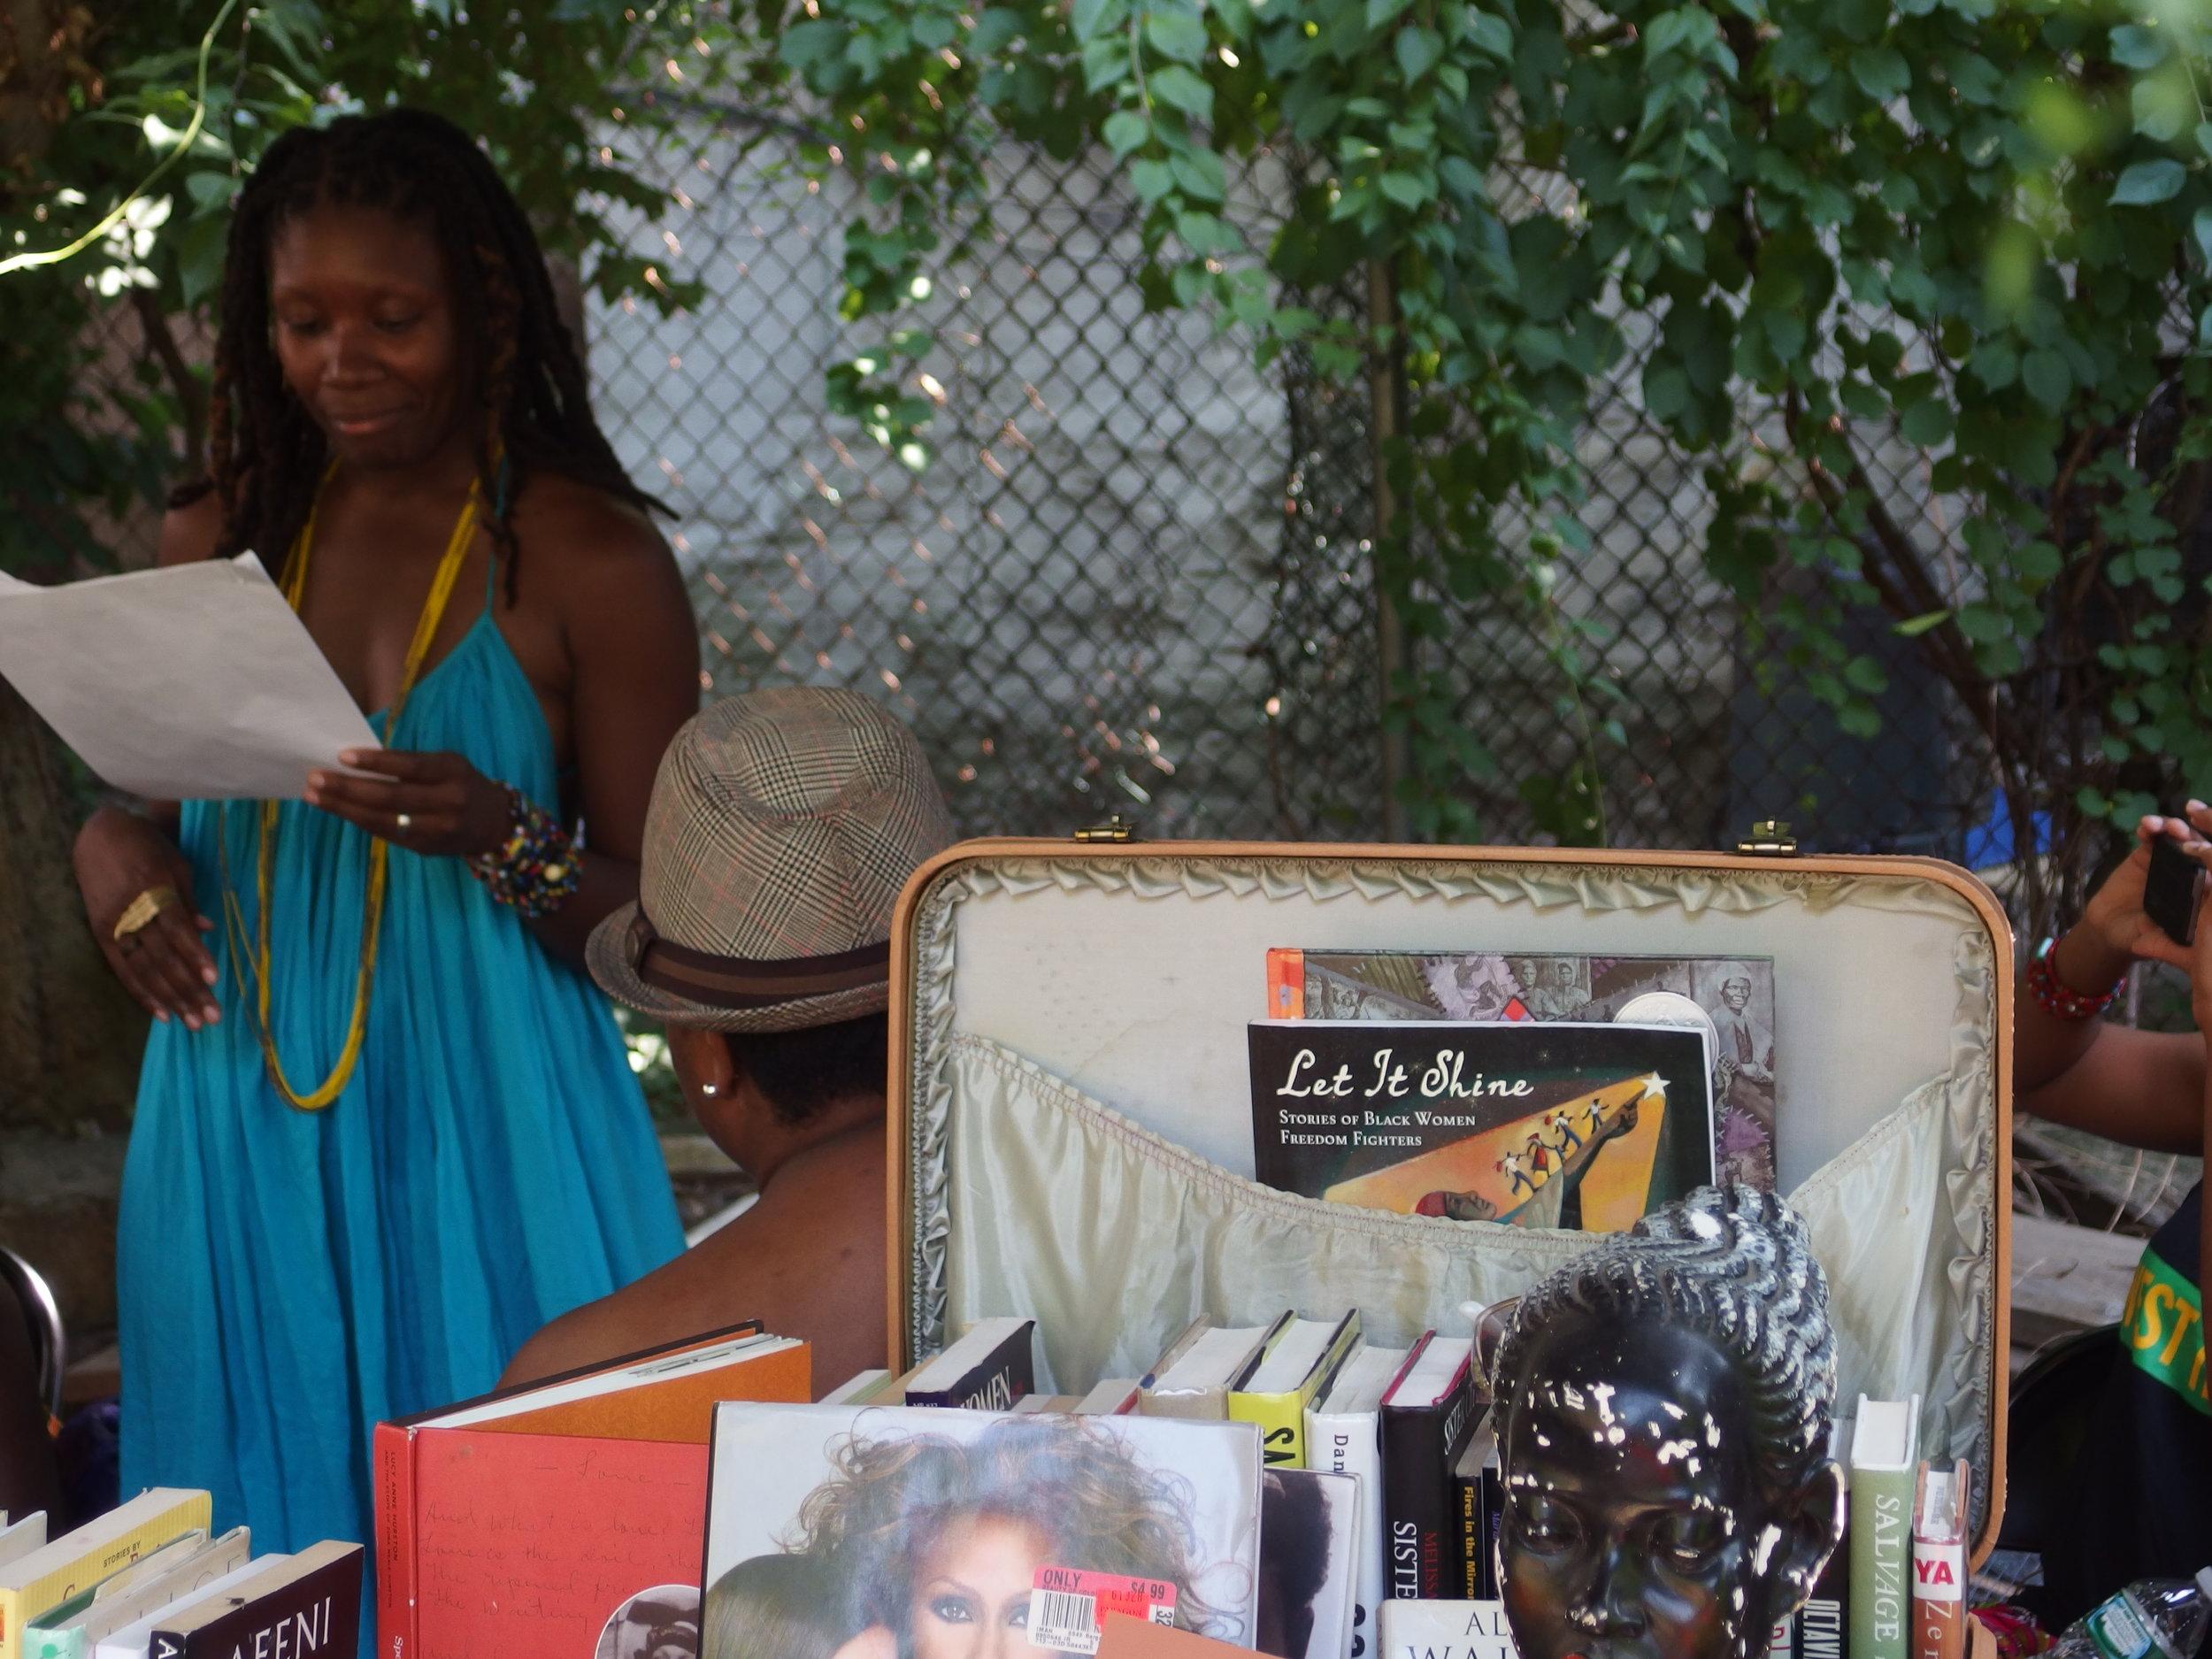 little-free-black-womens-library_20763165258_o.jpg